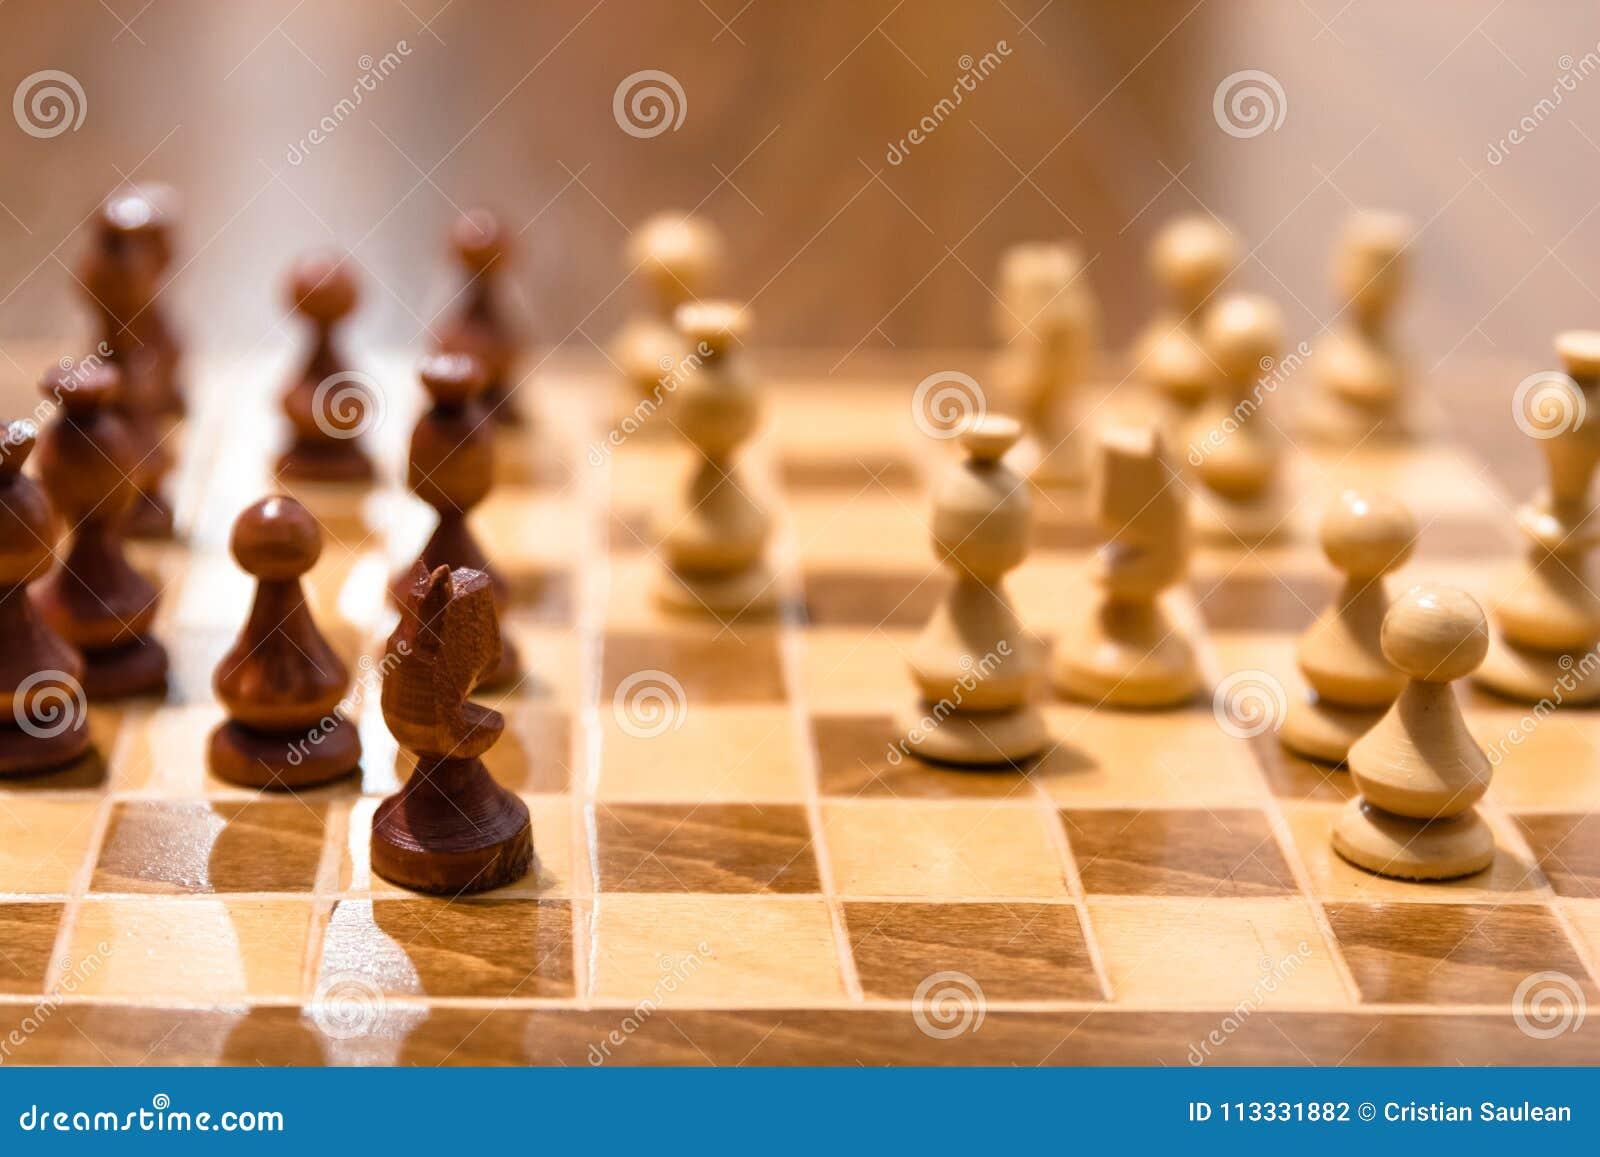 Szachowej gry deska